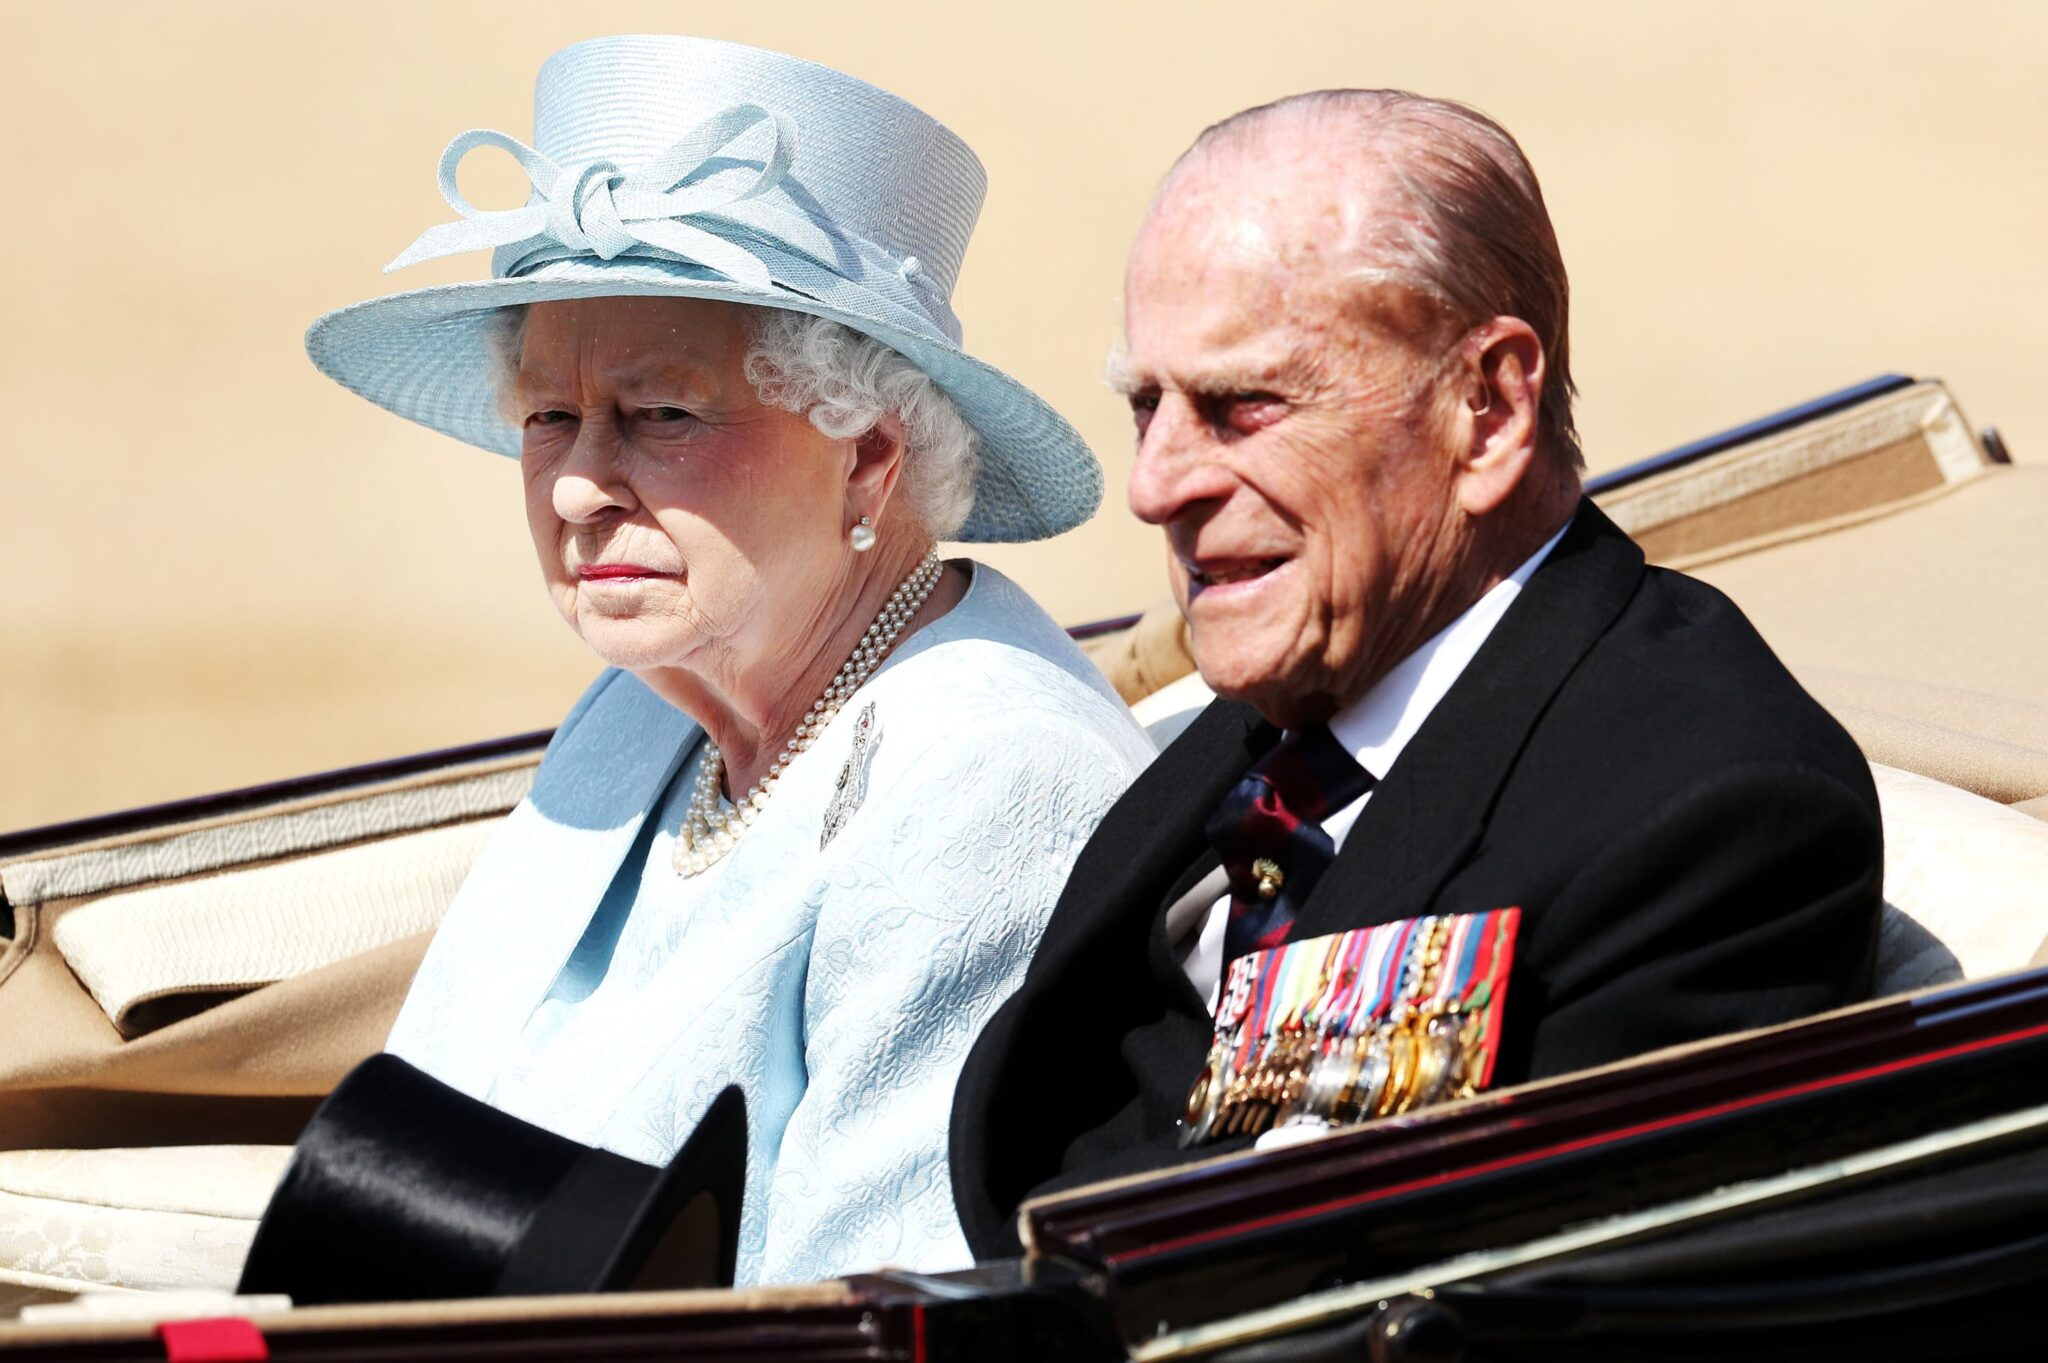 The Queen Turns 95